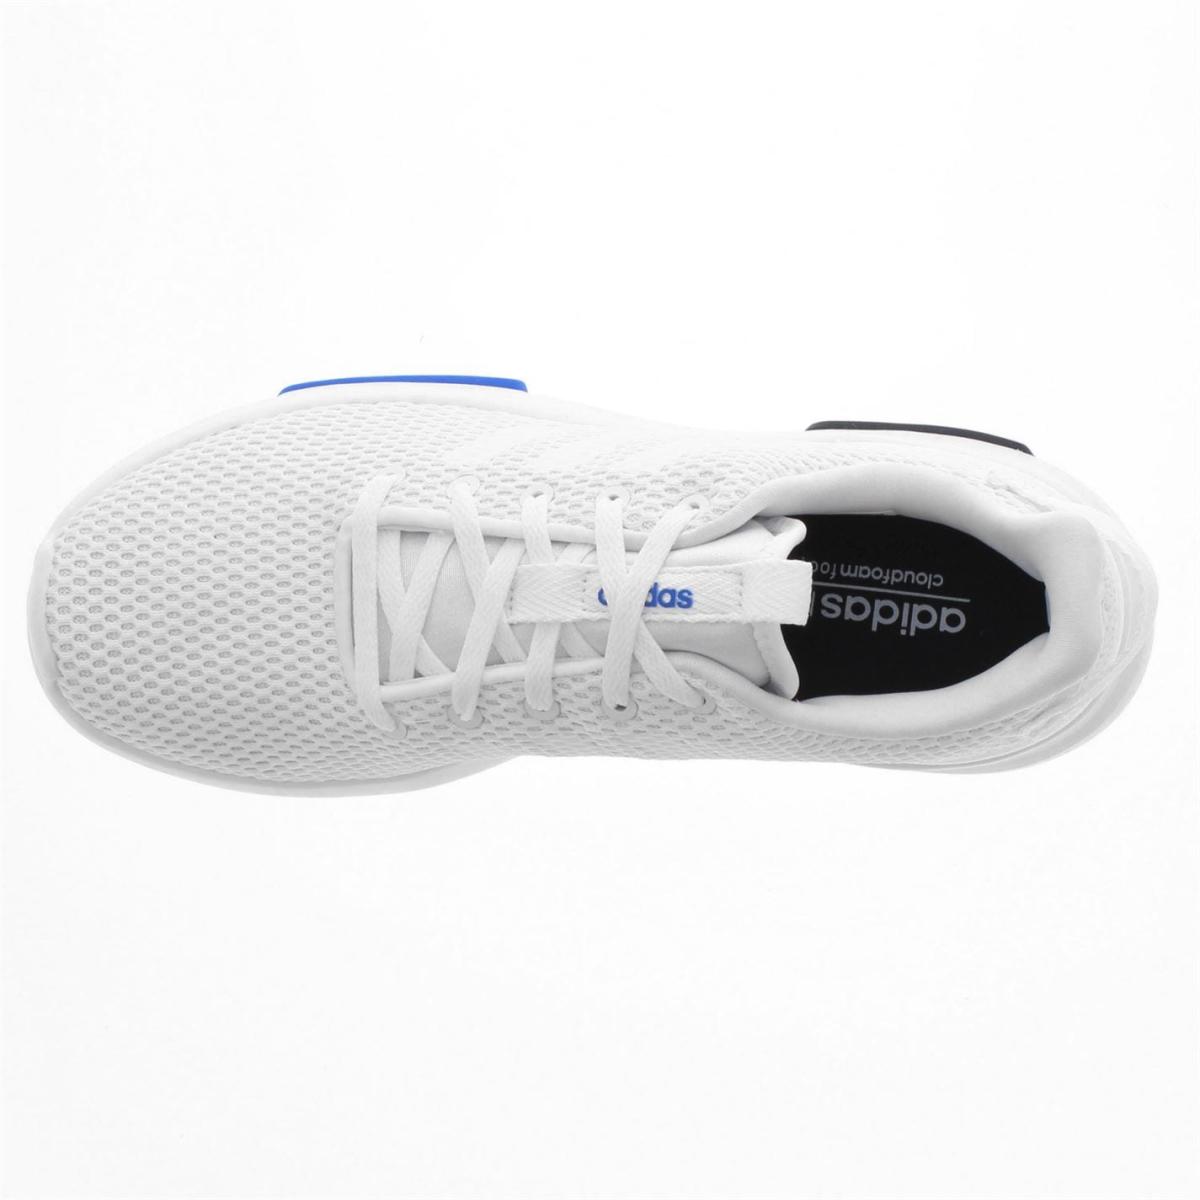 adidas Cloudfoam Racer Herren Turnschuhe Sportschuhe Wht_Wht_Blk_Blu